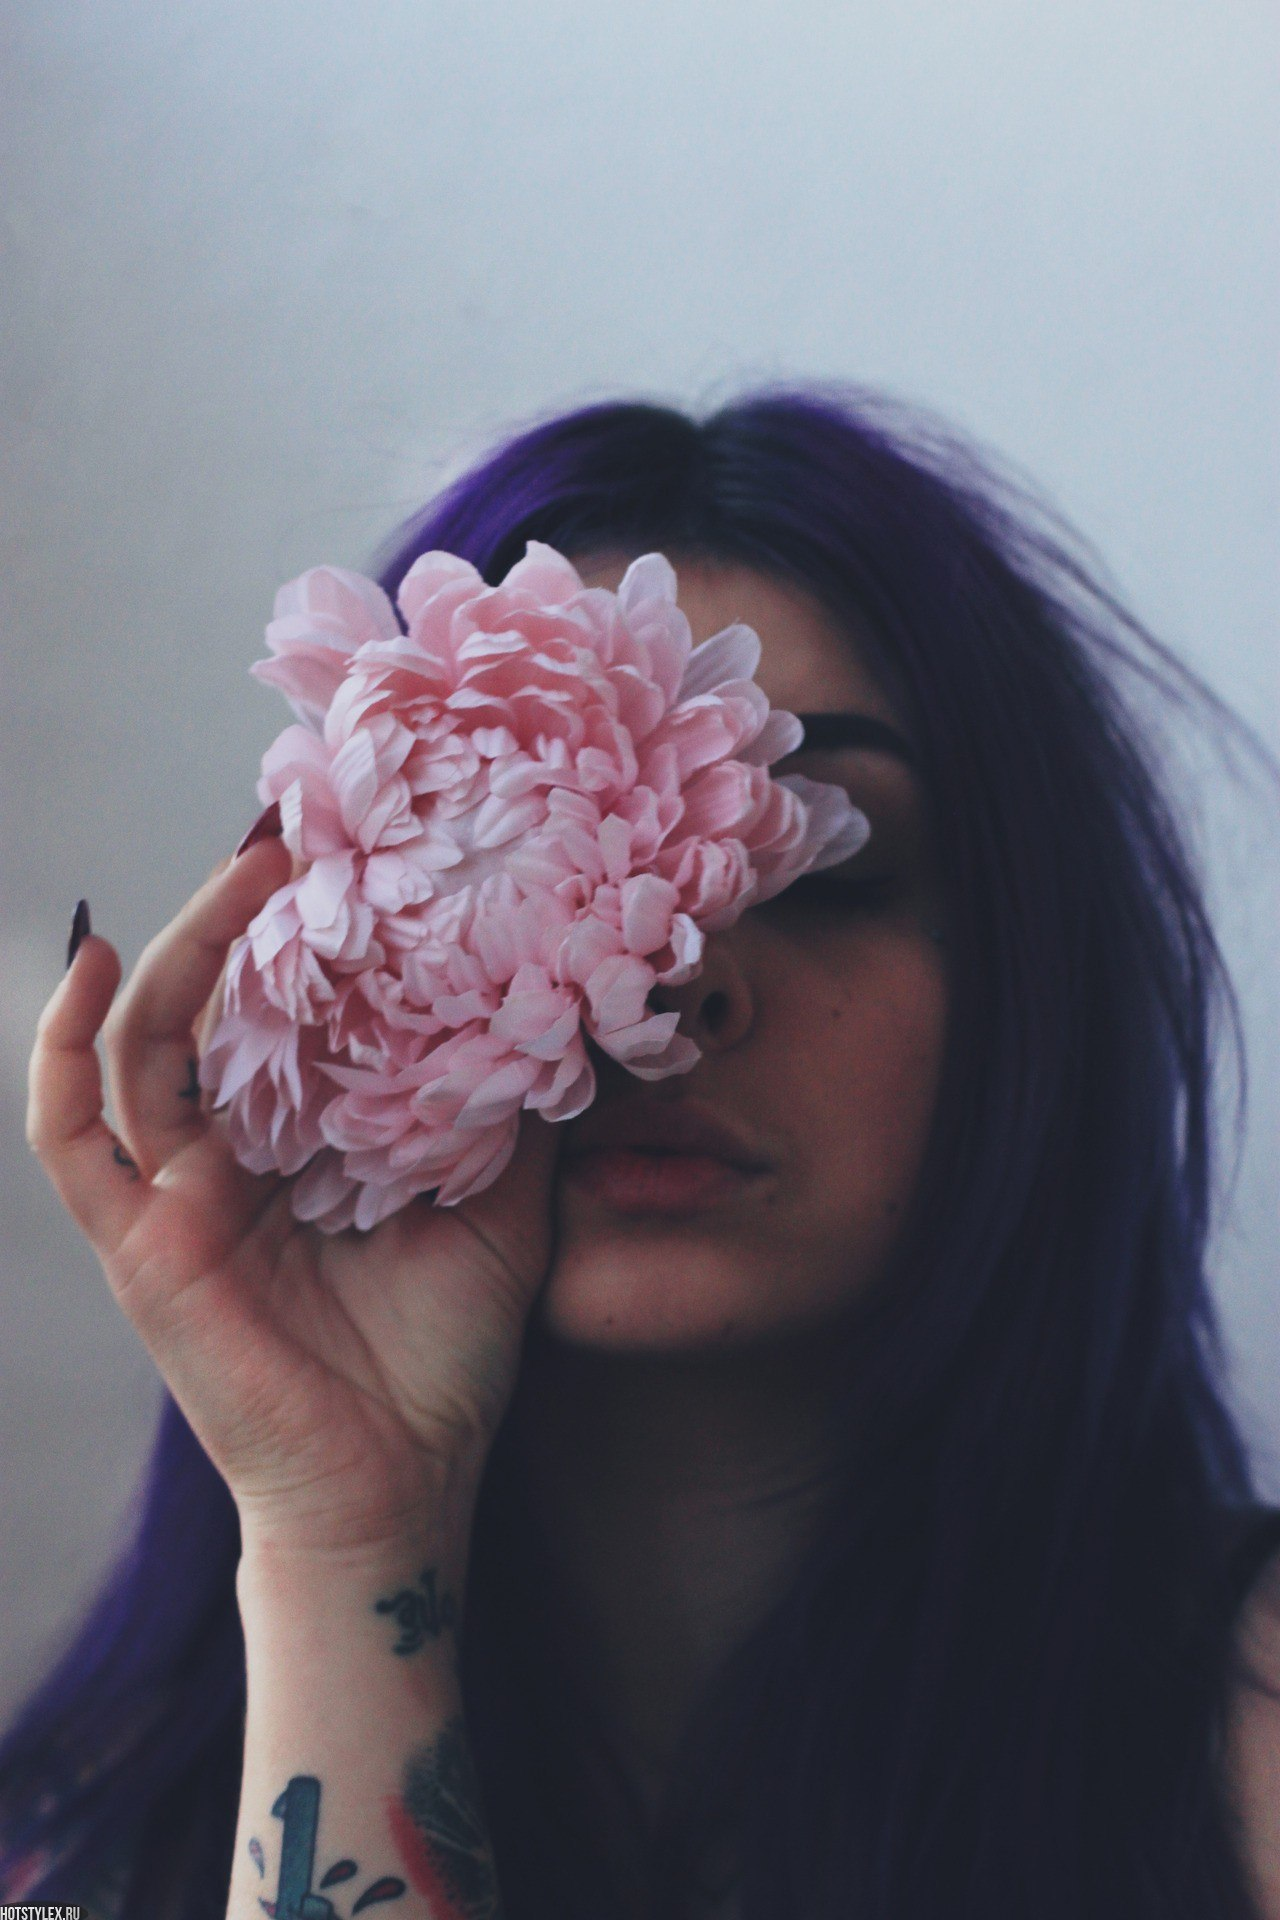 фото с цветами девушки на аву